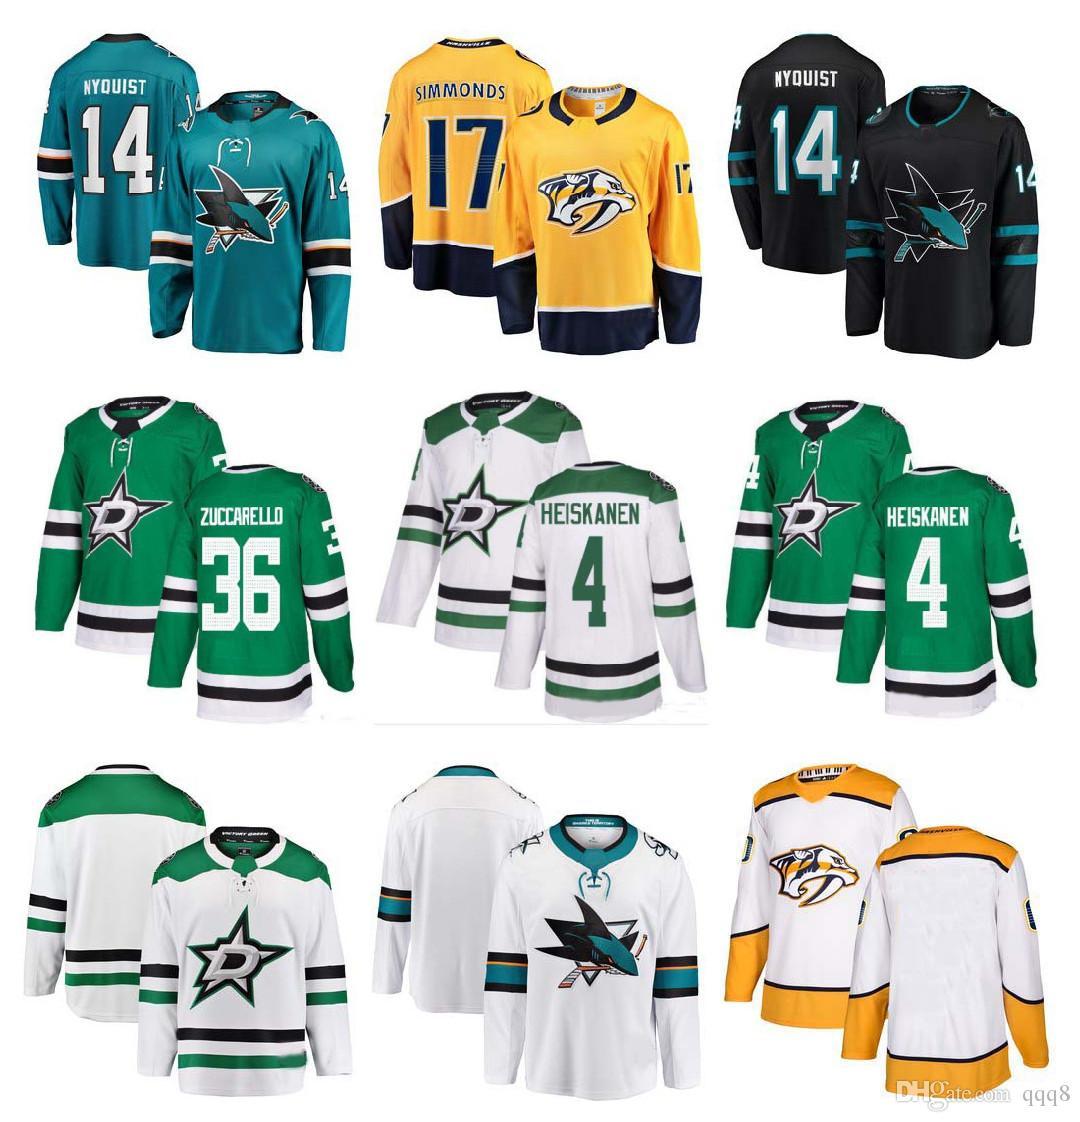 buy popular 669d5 76252 NHL Dallas Stars Jersey 36 Mats Zuccarello 4 Miro Heiskanen San Jose Sharks  14 Gustav Nyquist Nashville Predators 17 Wayne Simmonds Hockey